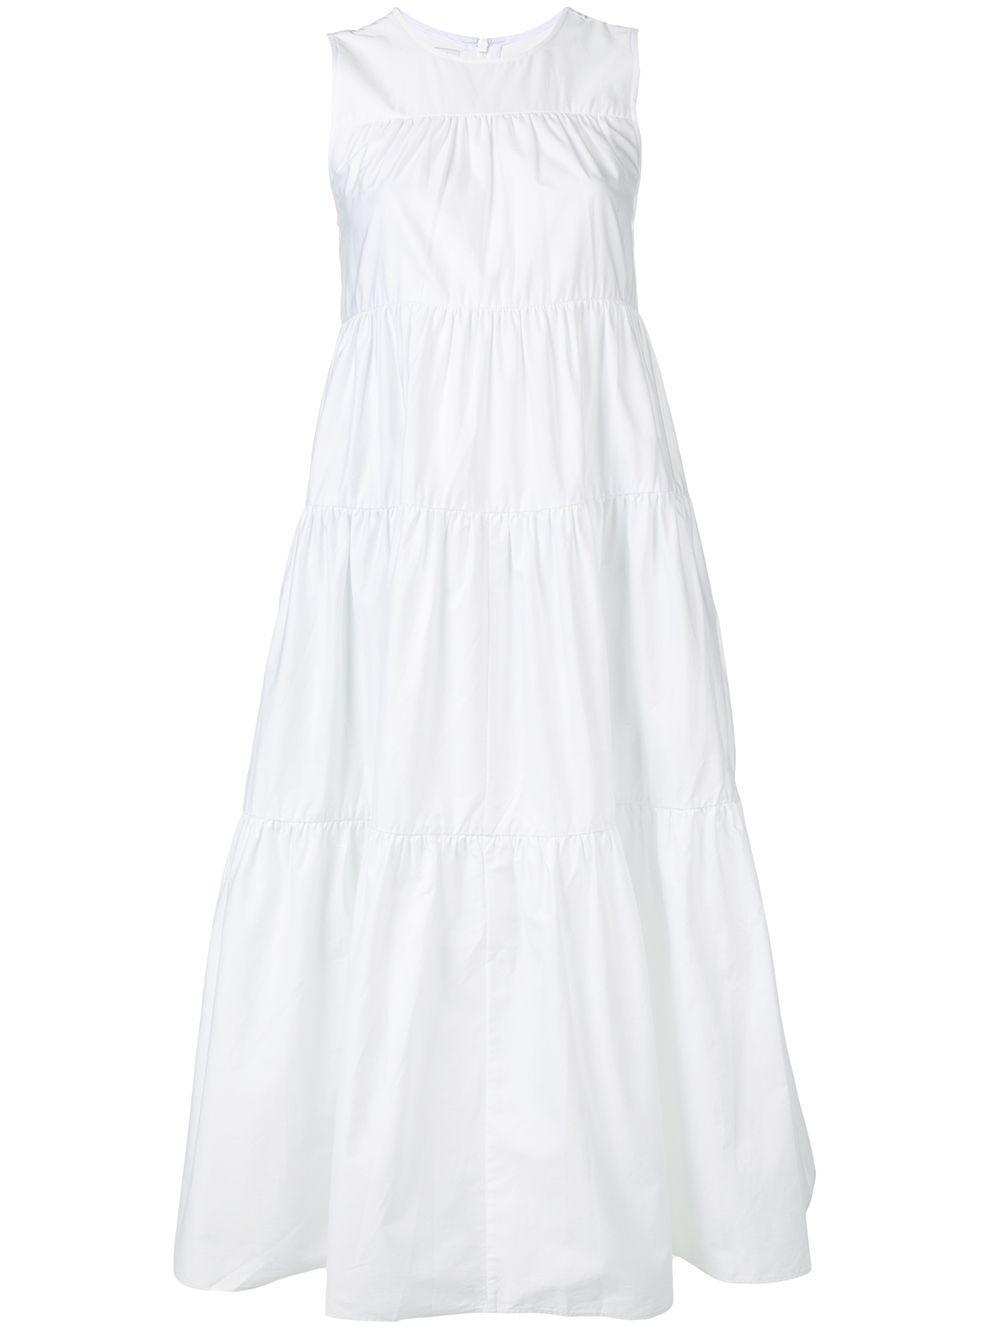 Sleeveless Tiered Dress